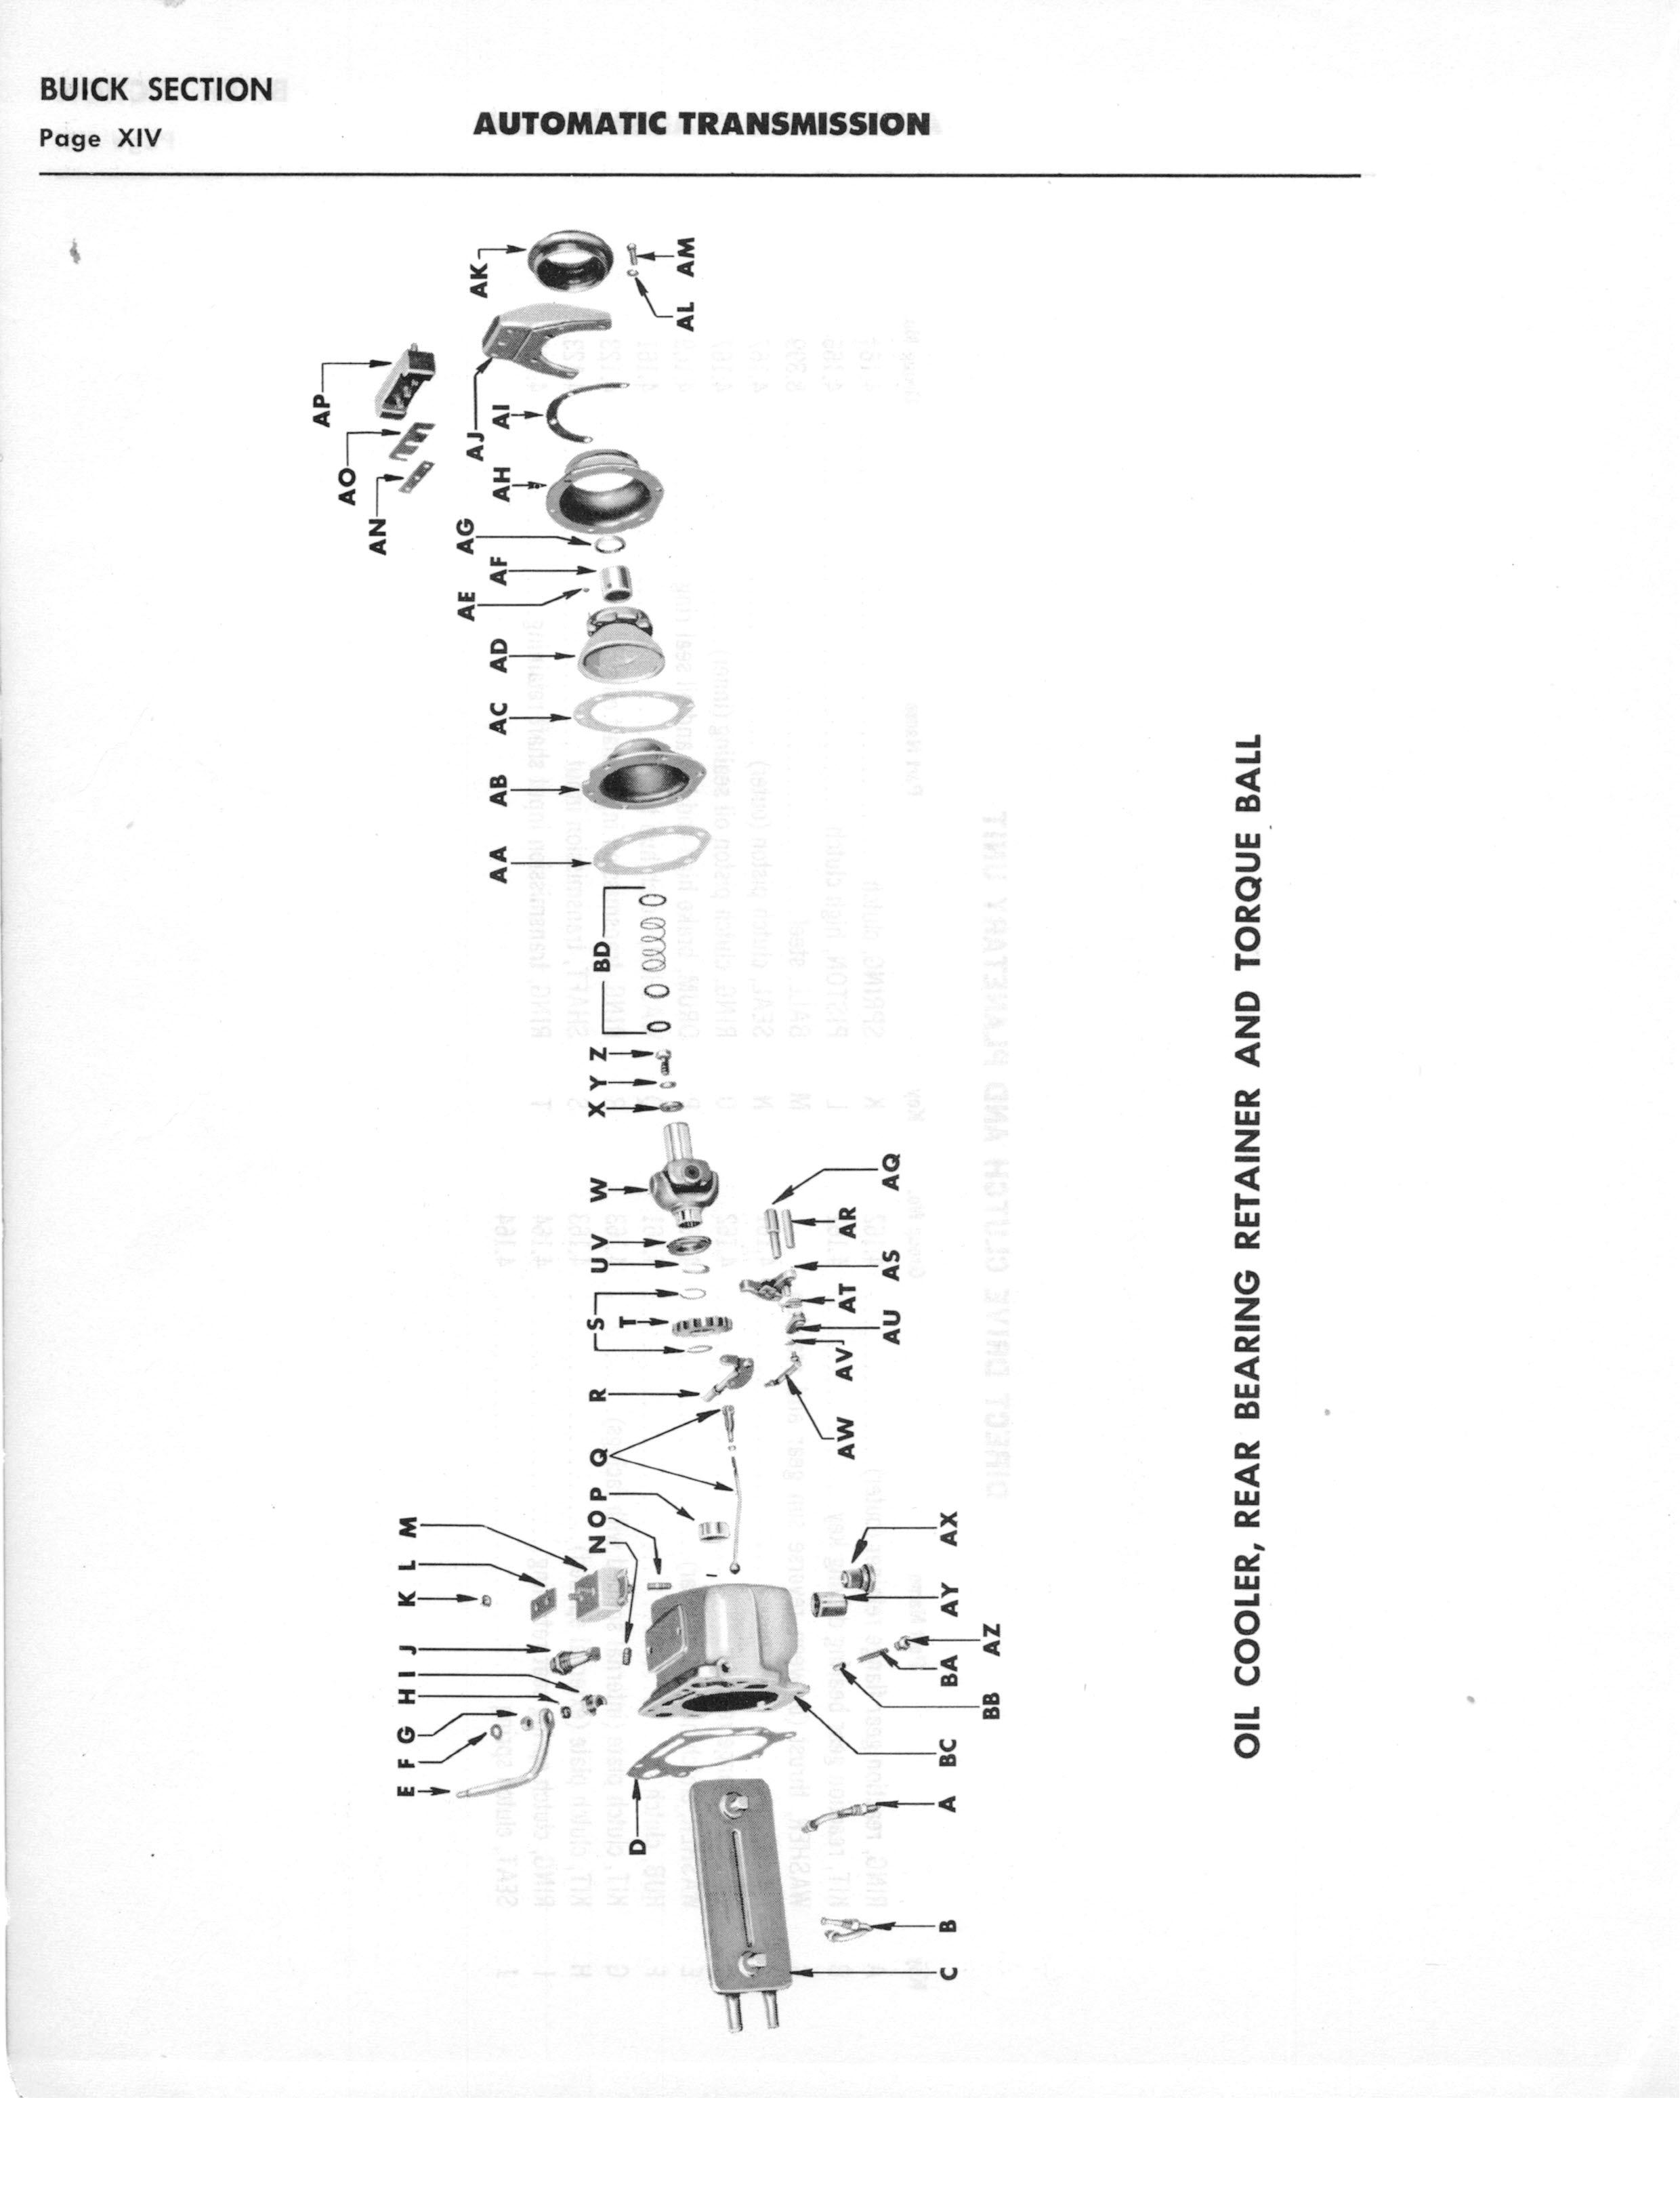 A-3010 Automatic Transmission Parts Catalog: Hydra-Matic